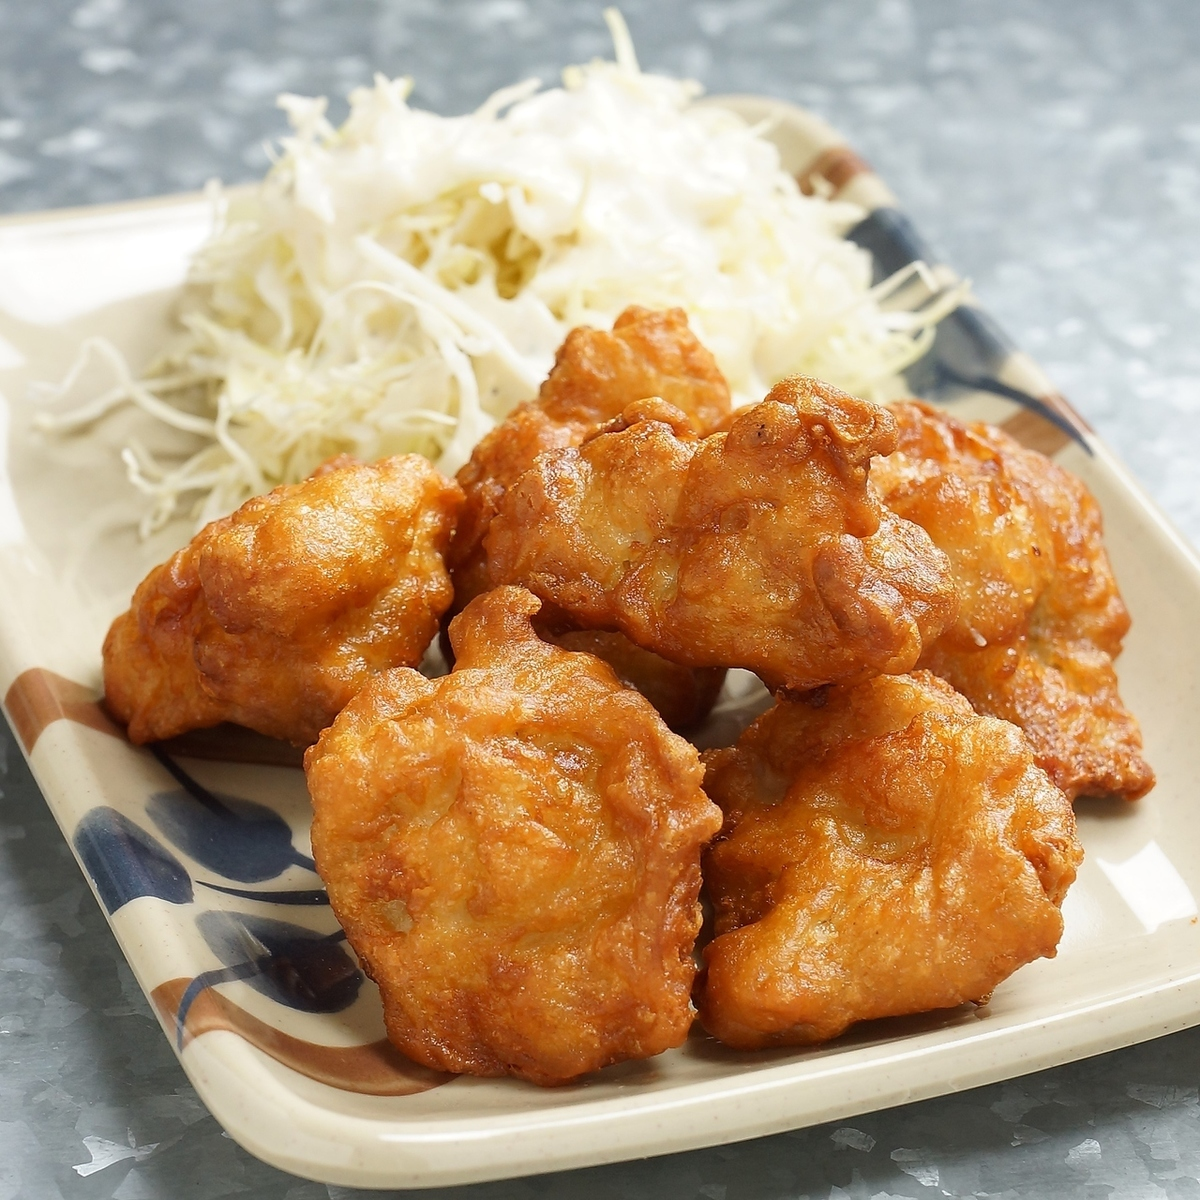 Deep-fried delicious yakitori shop